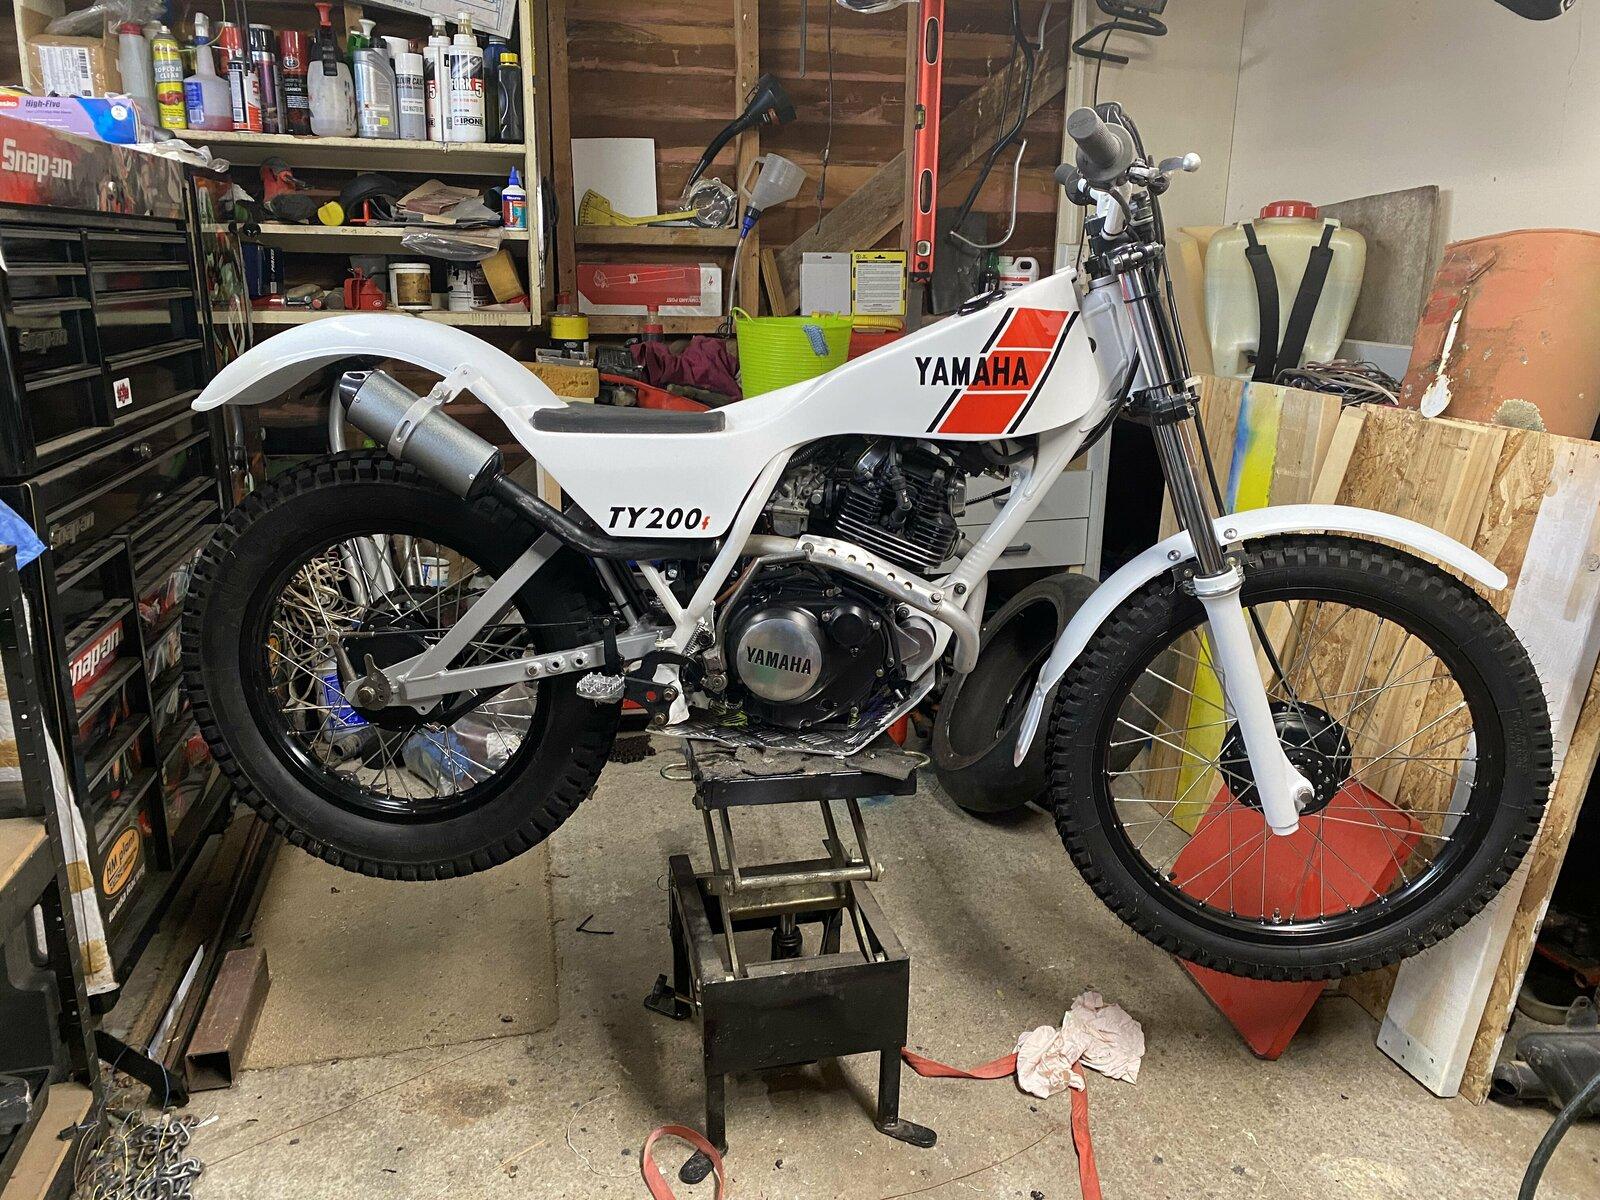 4t Yamaha 200 build.